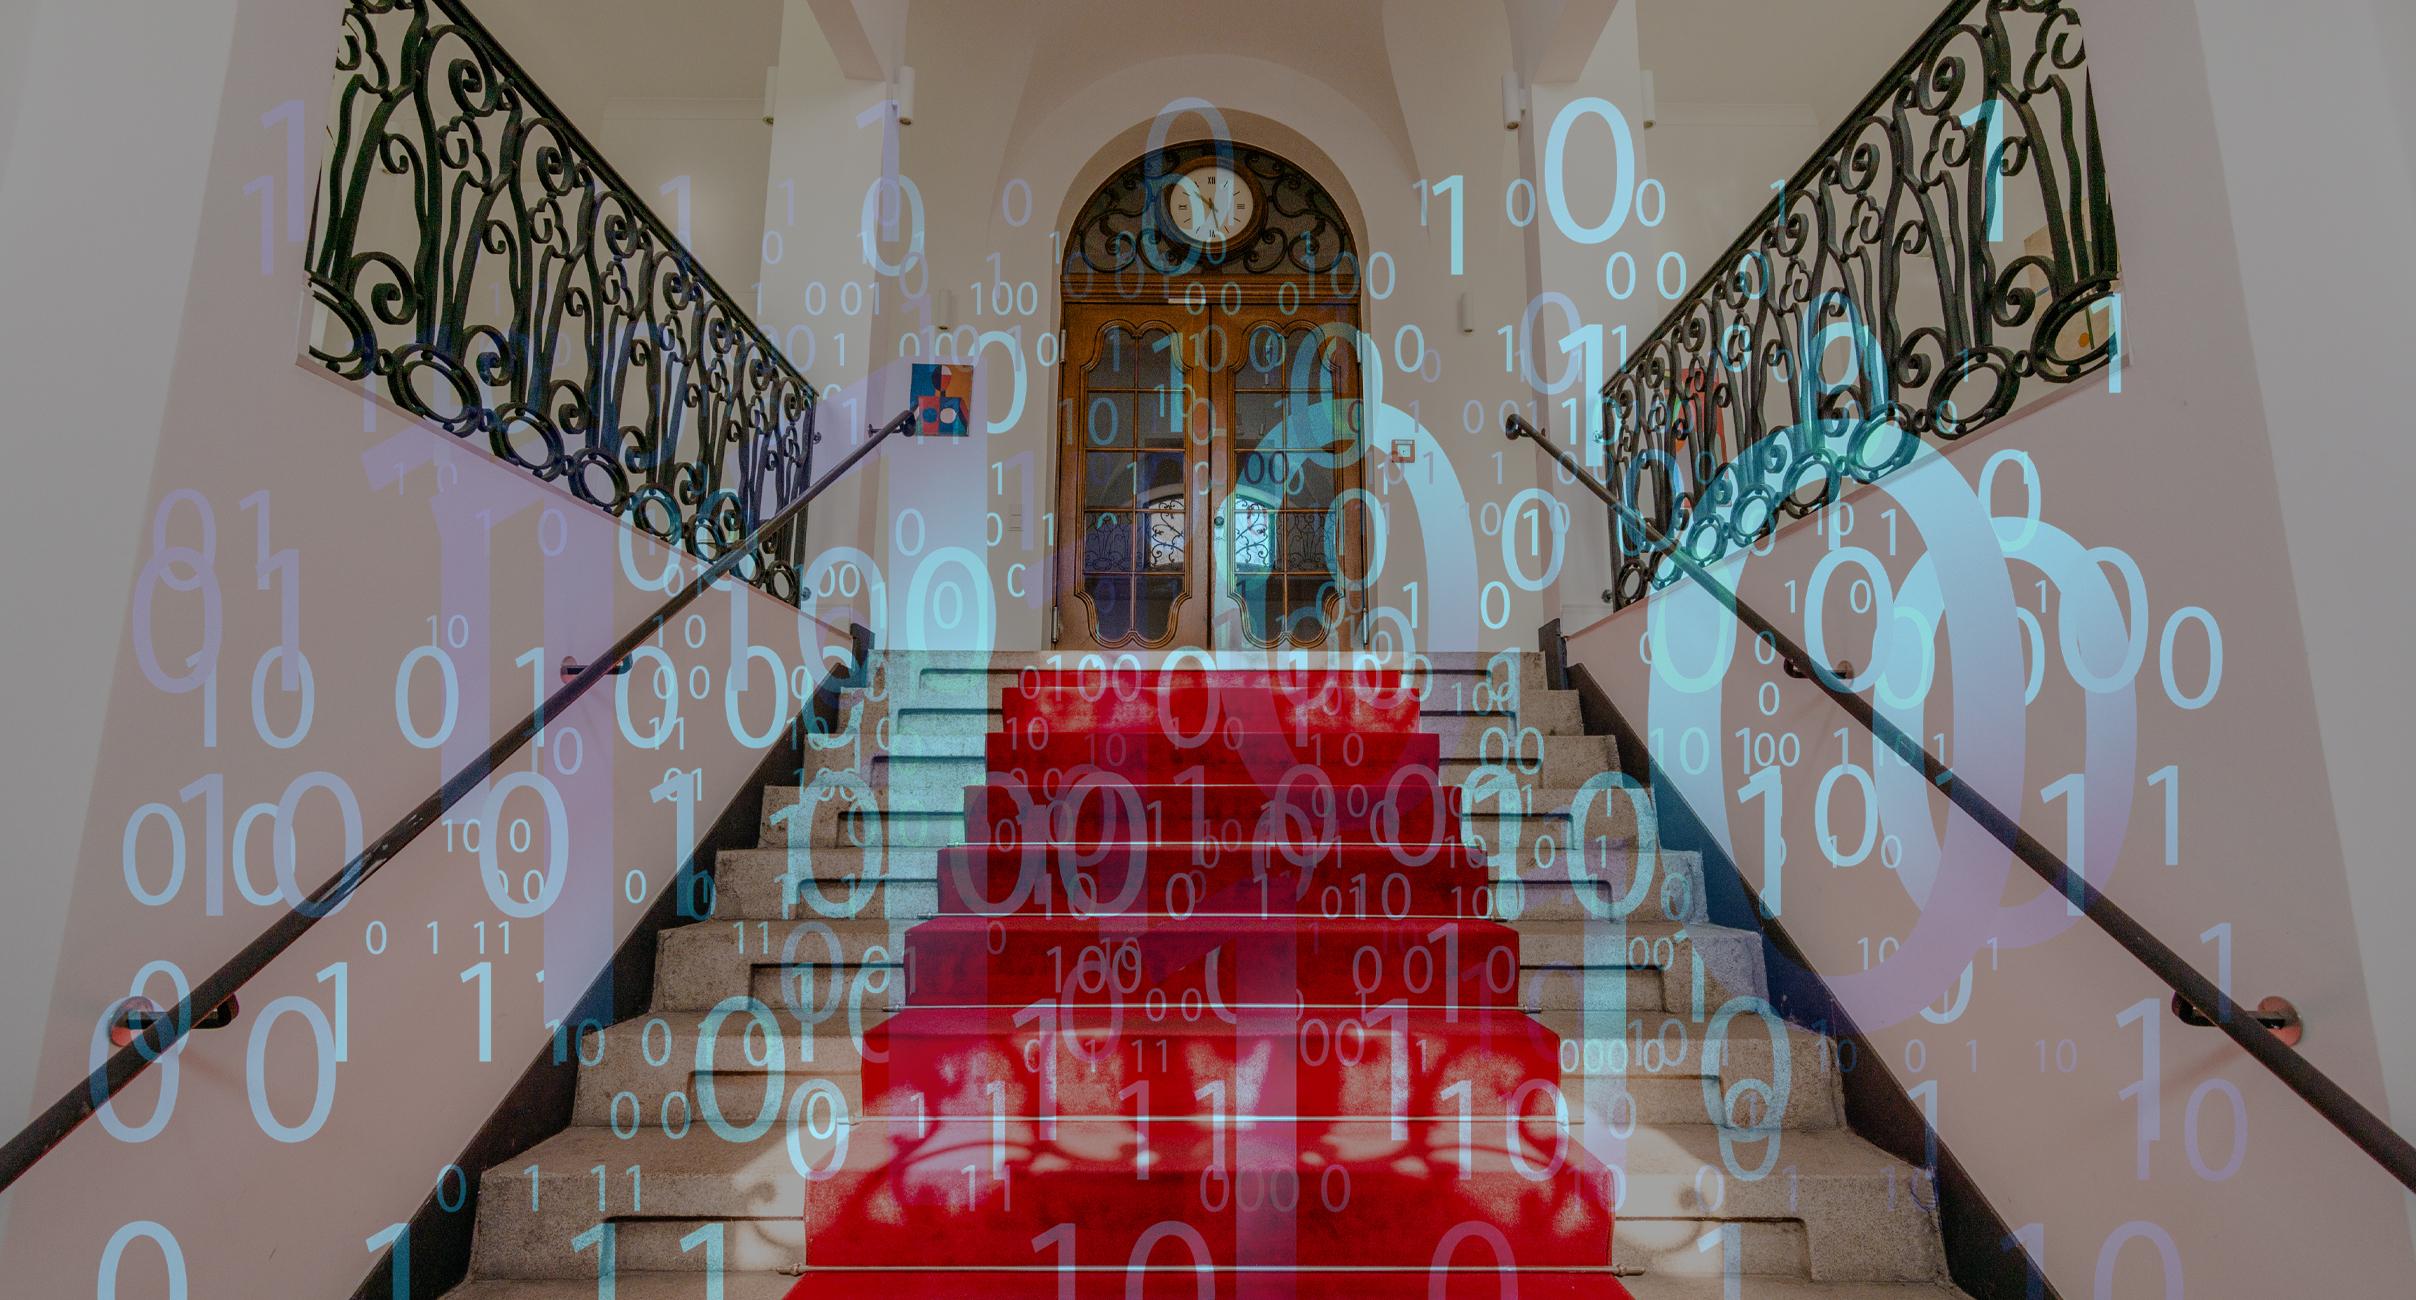 Digitalisierung Moderne Steuerberatung